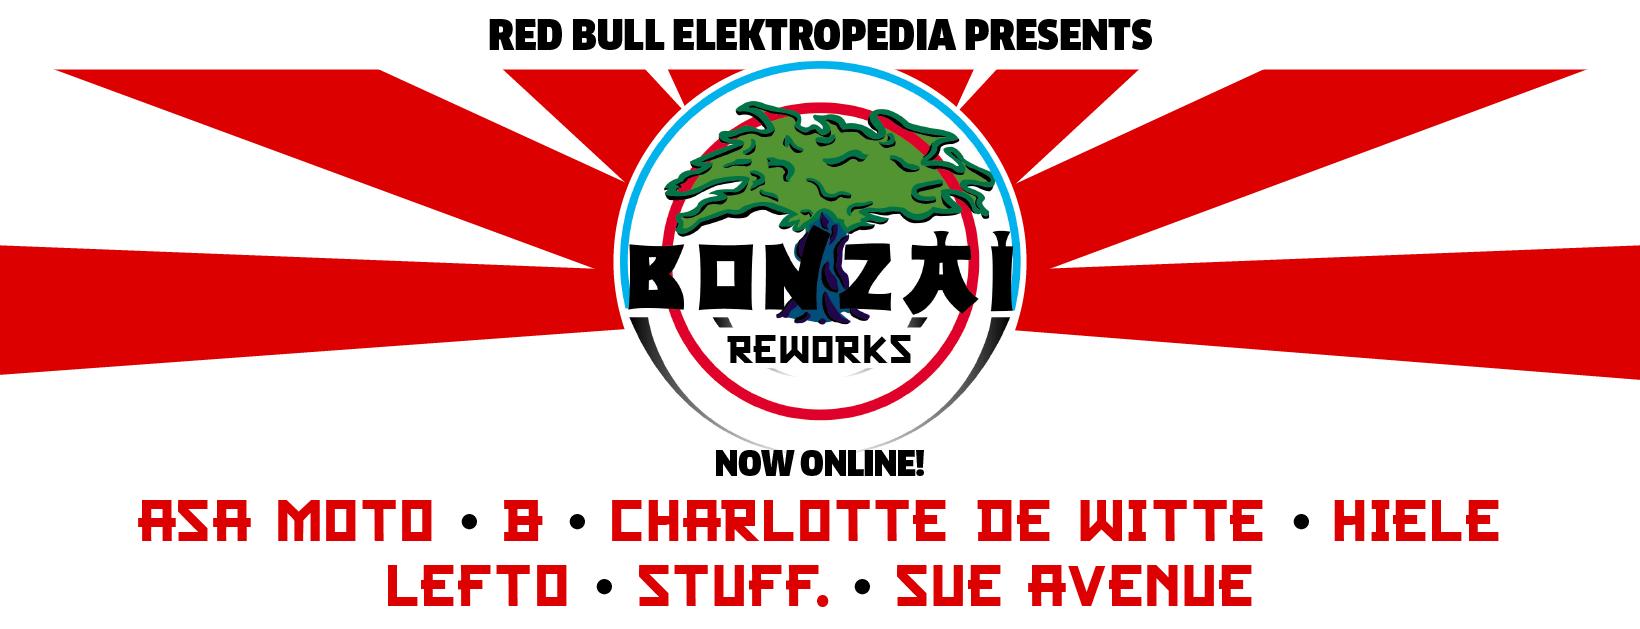 Jerboa Mastering - Red Bull Elektropedia - Bonzai Reworks